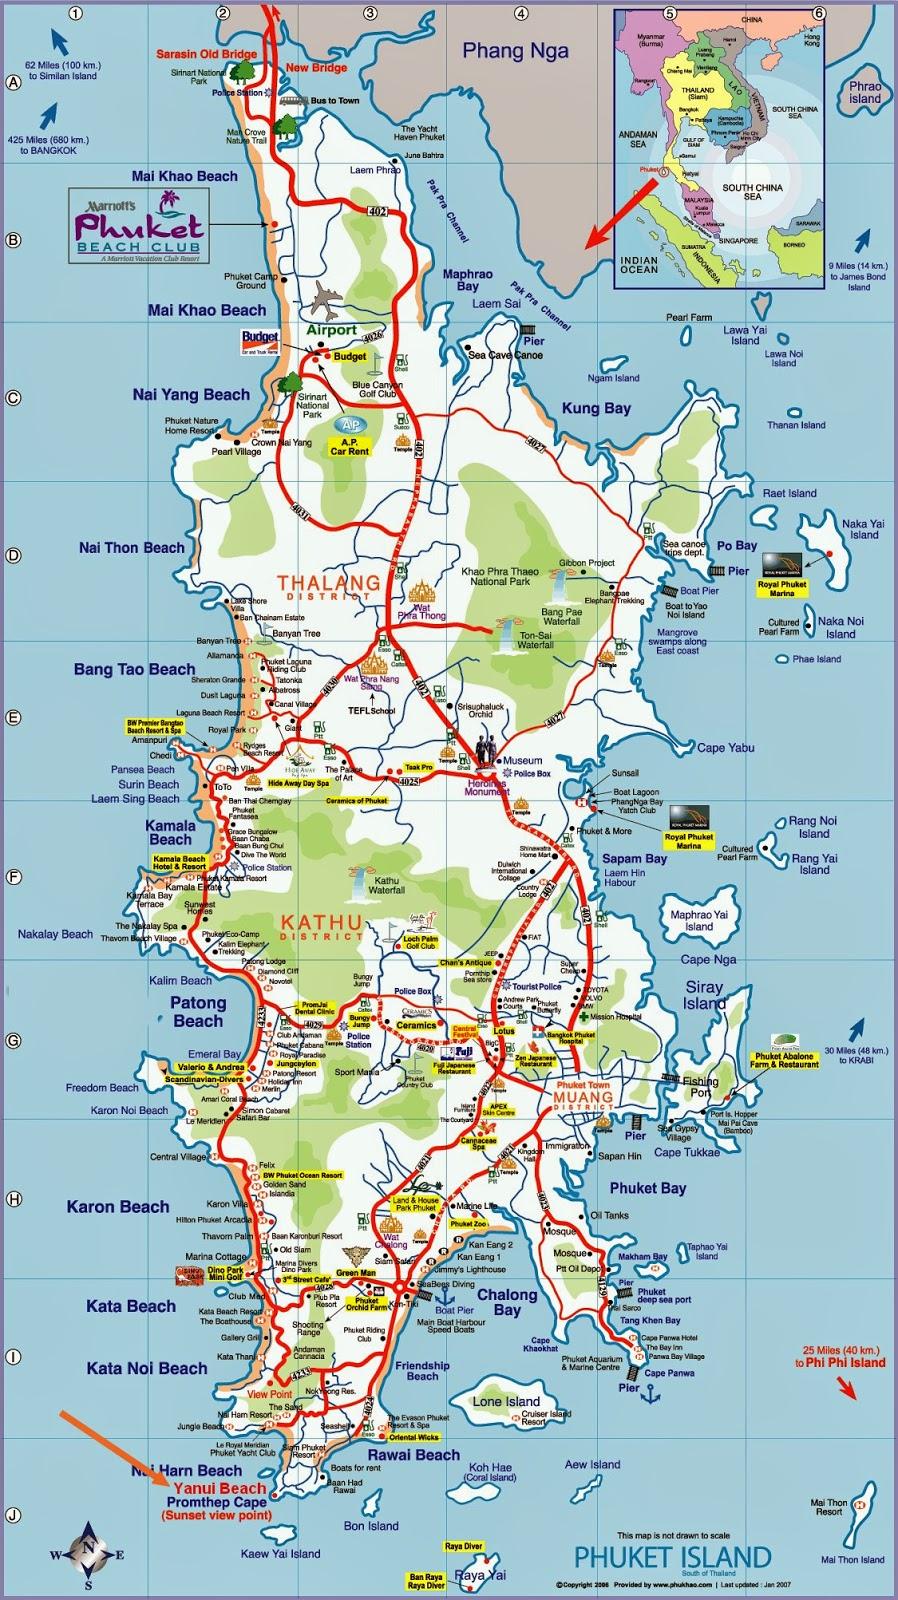 http://4.bp.blogspot.com/-vxLBdi7OpS8/U_CV_BtPBMI/AAAAAAAAIoo/ine7UsPXoJ4/s1600/Yanui-Beach-Phuket-Thailand-Location-Map.jpg